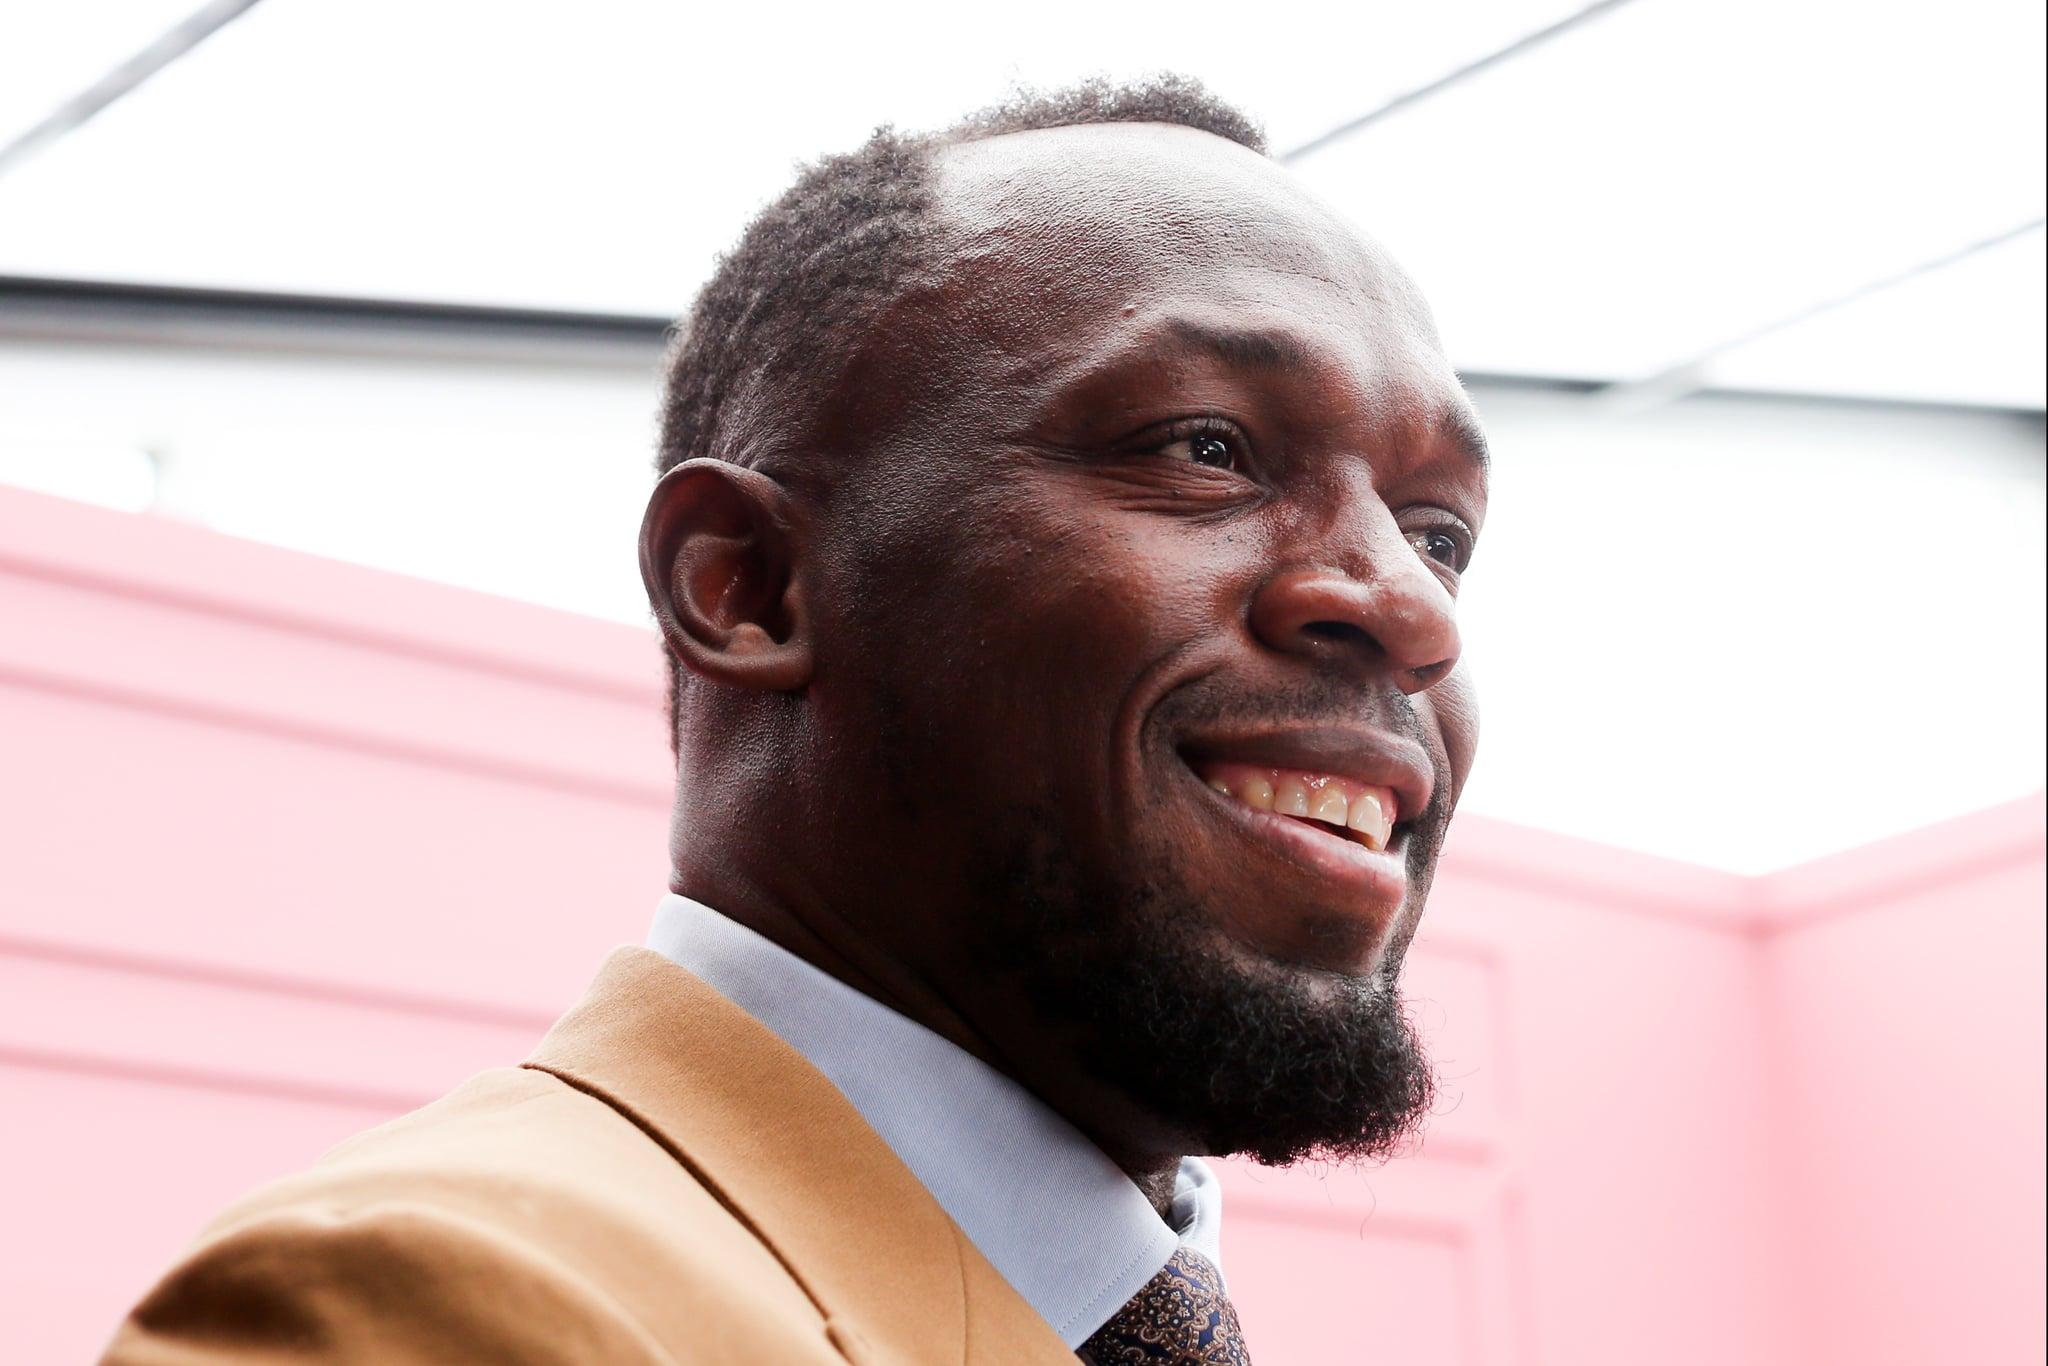 MELBOURNE, AUSTRALIA - NOVEMBER 07: Usain Bolt attends 2019 Oaks Cup Day at Flemington Racecourse on November 07, 2019 in Melbourne, Australia. (Photo by Asanka Ratnayake/Getty Images)